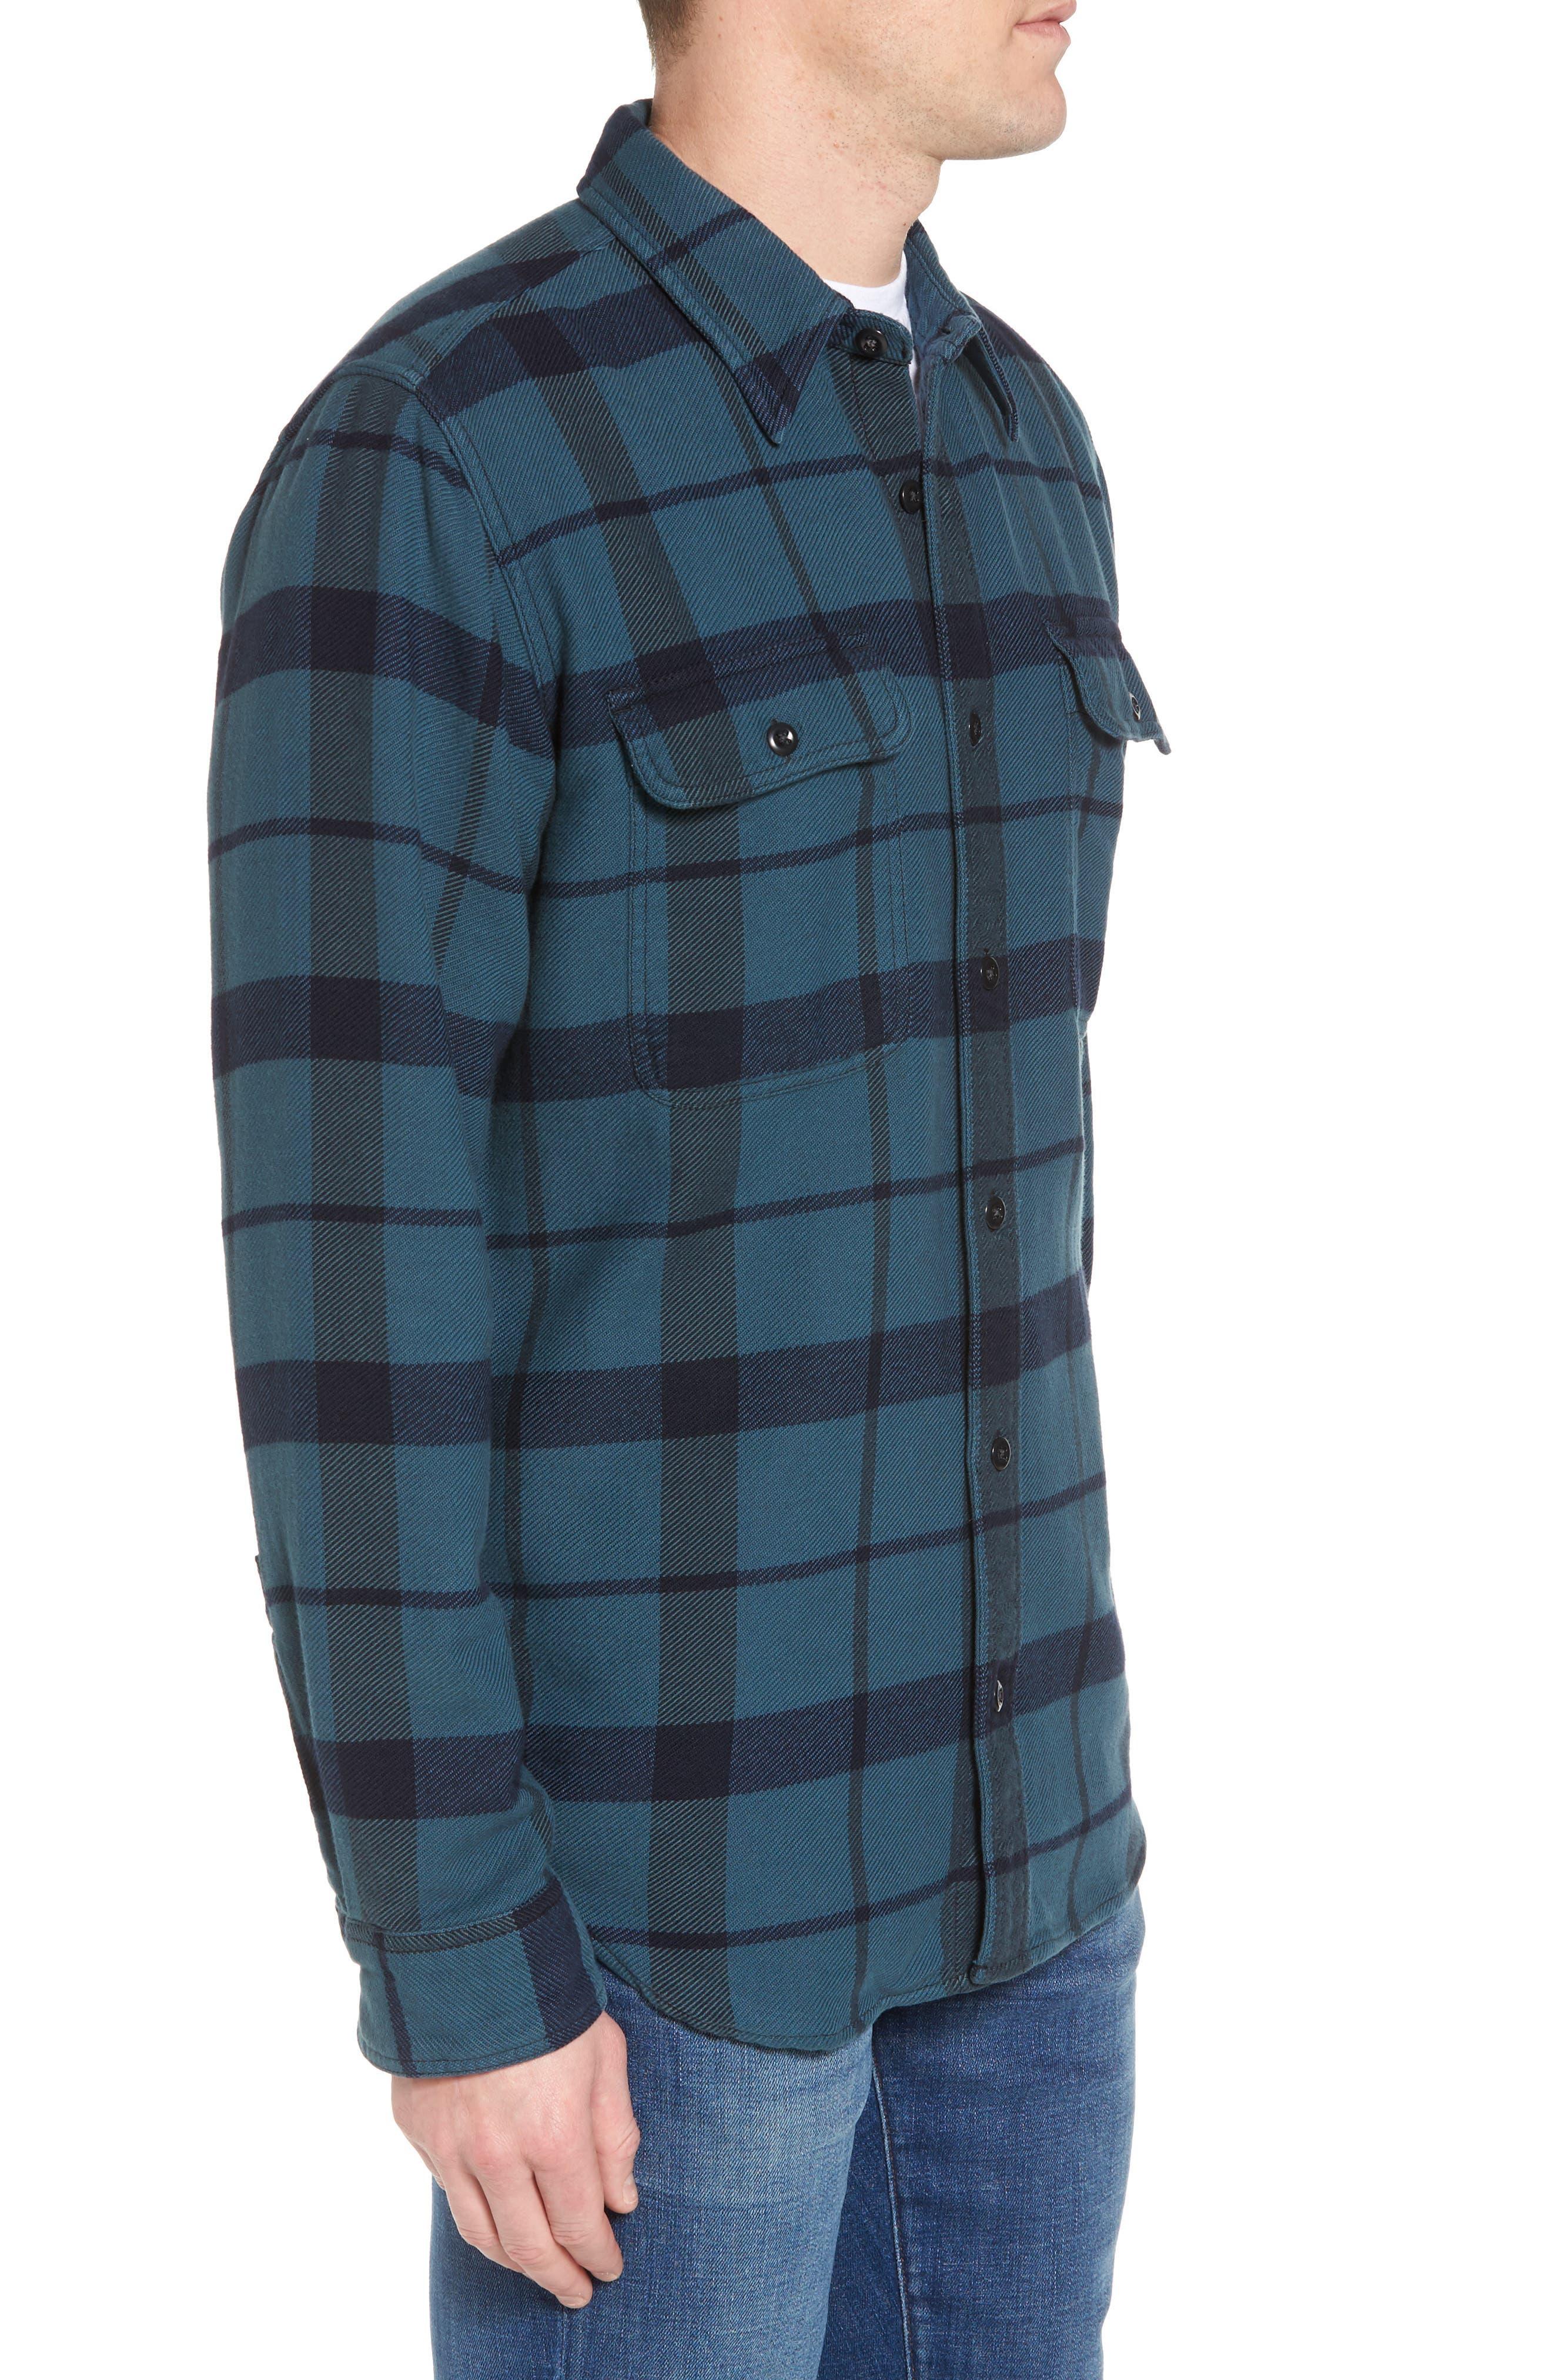 'Vintage Flannel' Regular Fit Plaid Cotton Shirt,                             Alternate thumbnail 8, color,                             Brown/ Navy